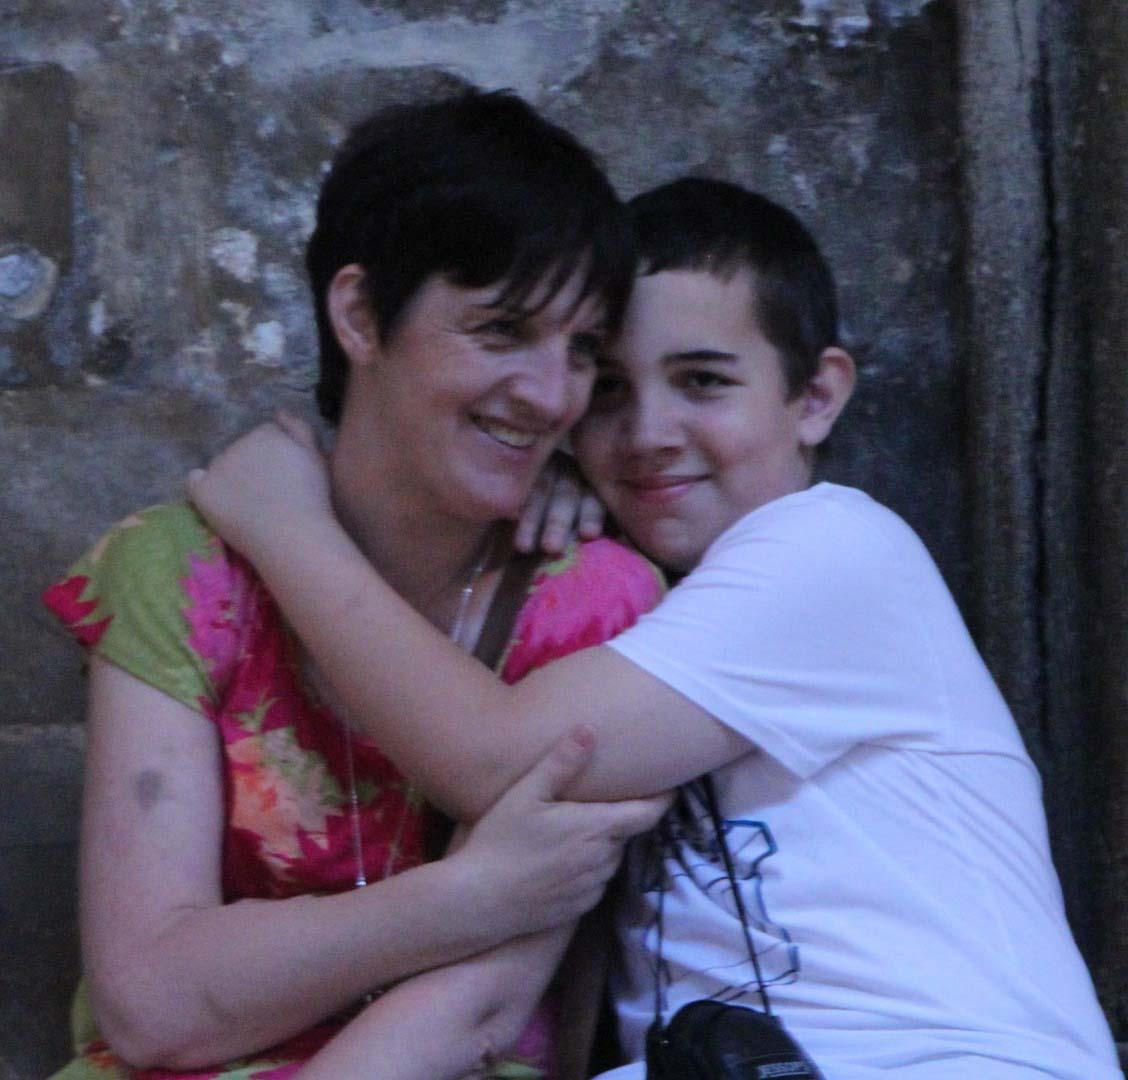 Ben and Karen Glean, hugging